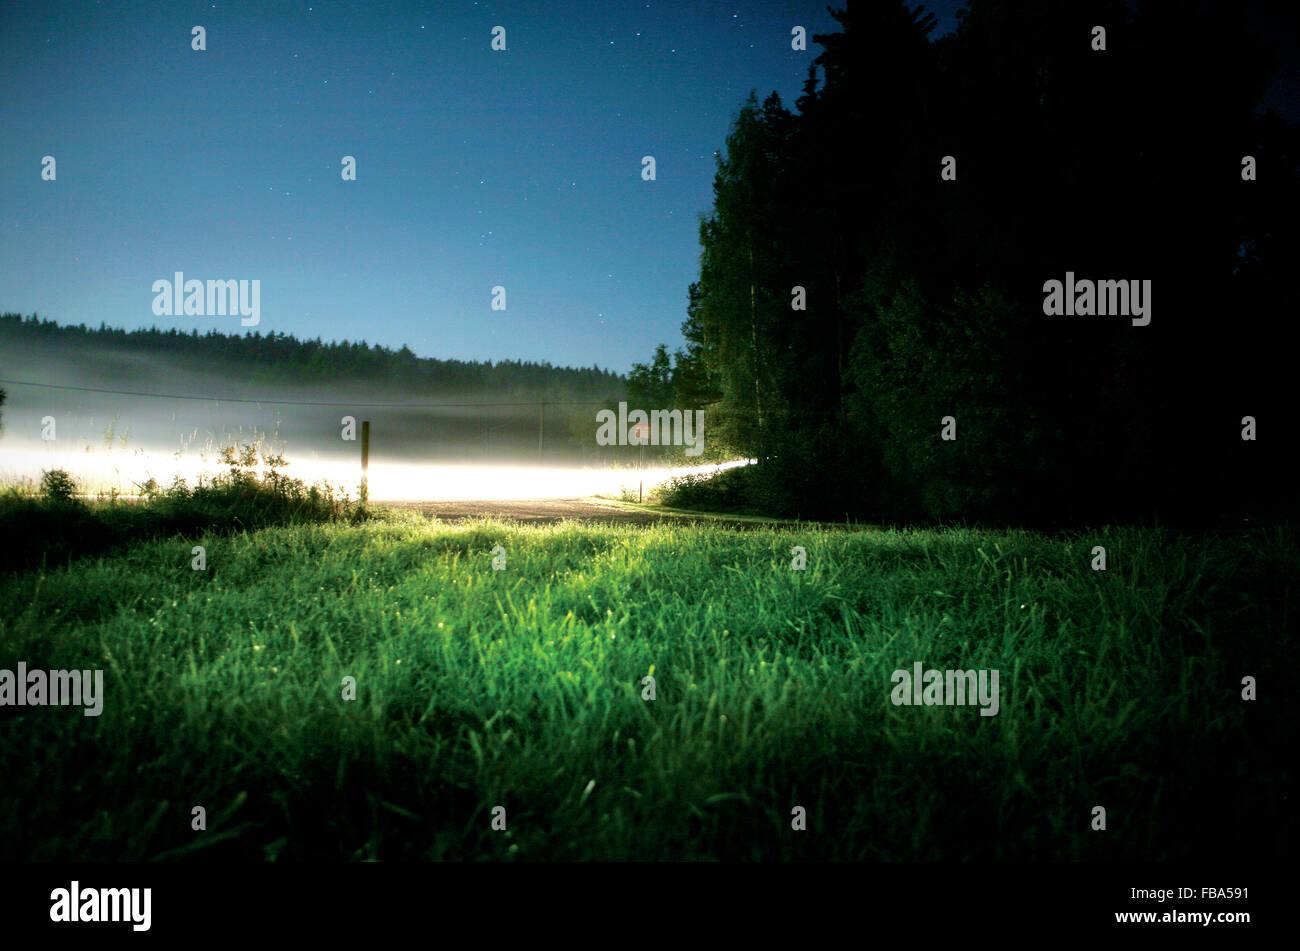 Sweden, Ostergotland, Grassy glade at night - Stock Image